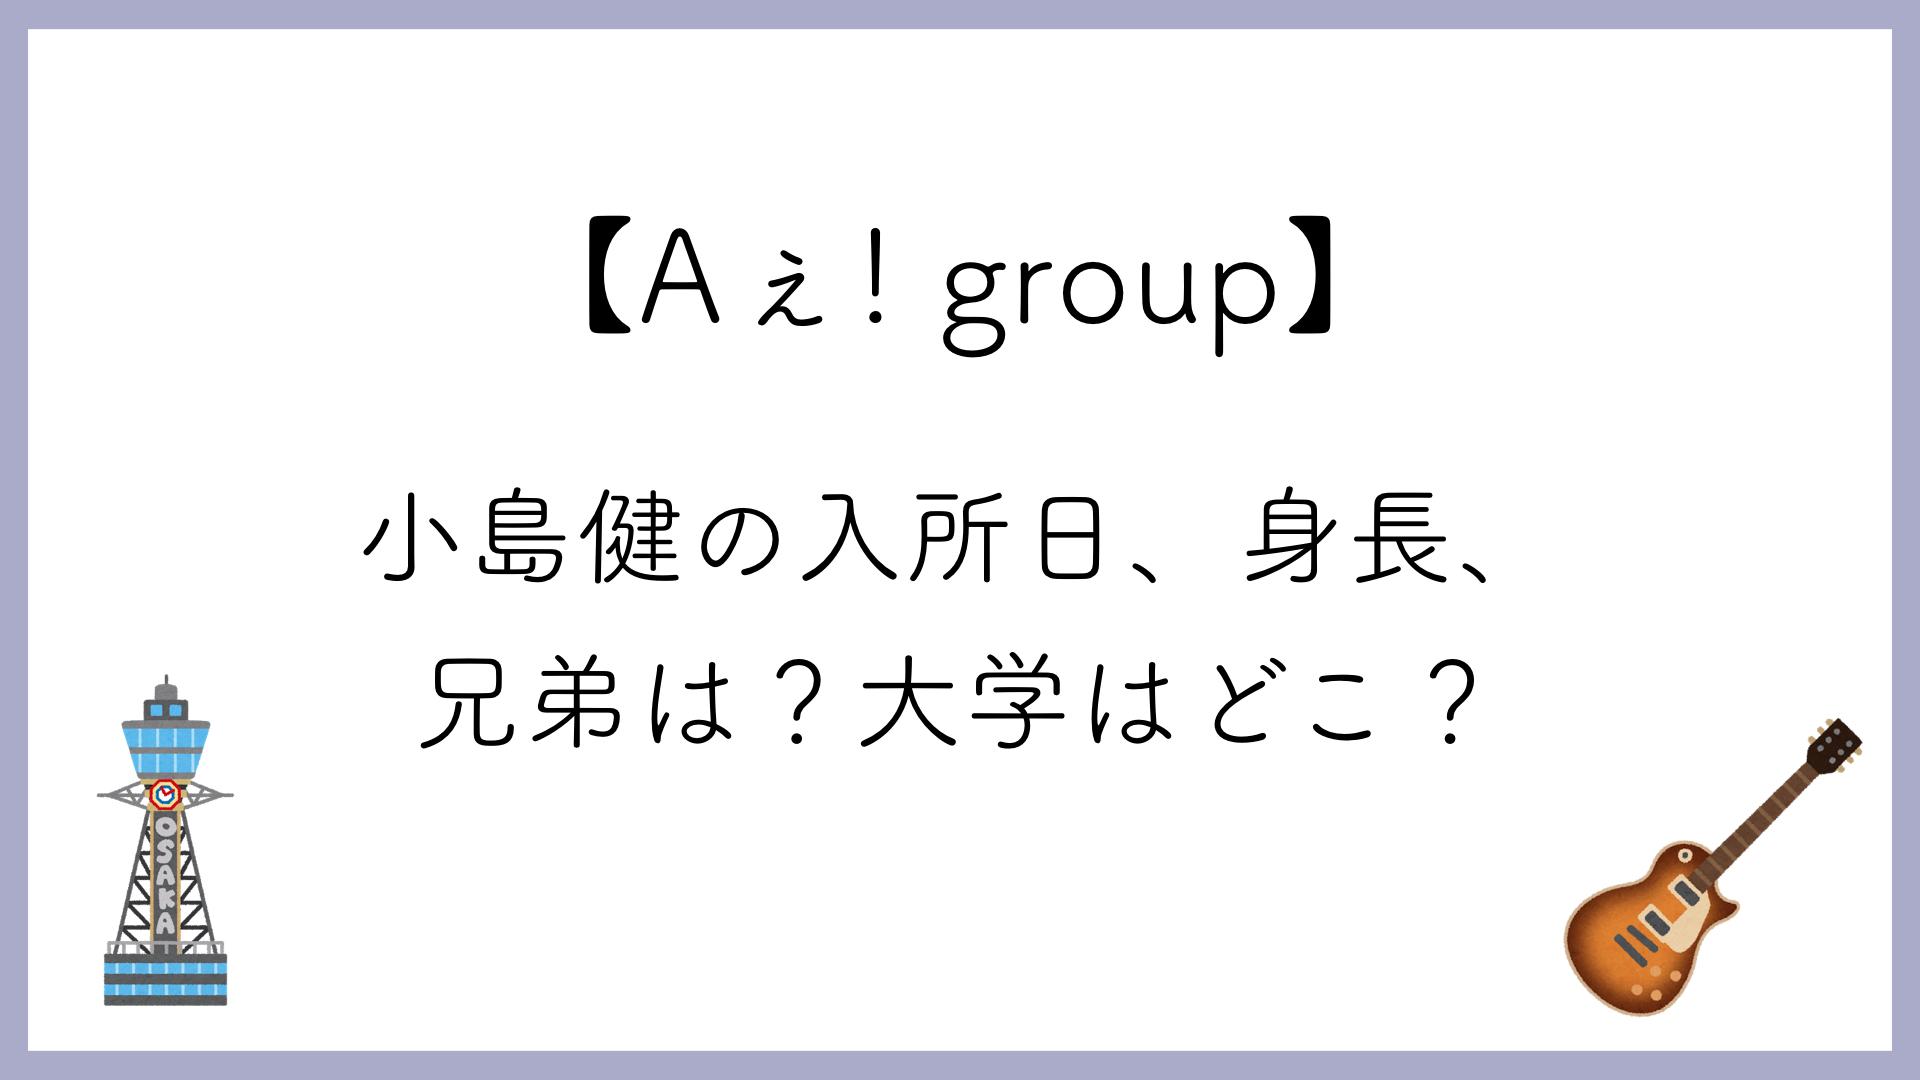 【Aぇ! group】小島健の入所日、身長、兄弟は?大学はどこ?